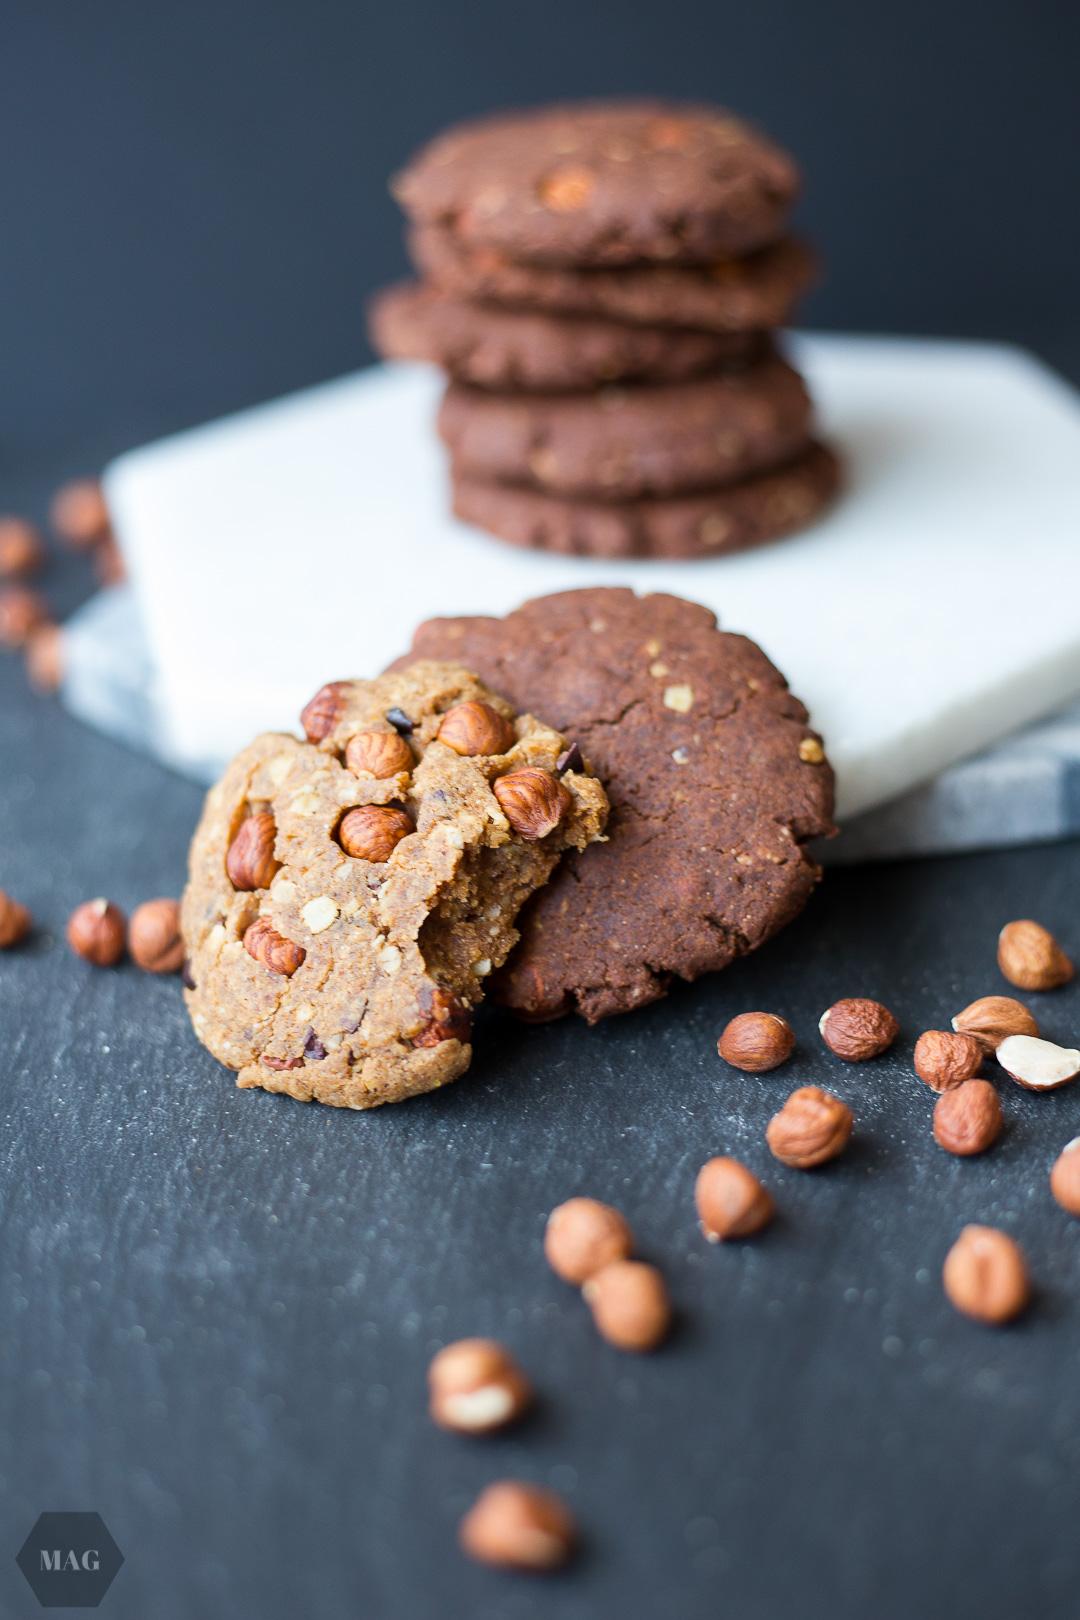 Schoko-Cookies, Schokoladenkekse, Schokoladen-Cookies, Vegane Schoko-Kekse, Vegane Cookies, Vegane Kekse, Vegane Schokoladen-Cookies, zuckerfrei, glutenfreie Kekse